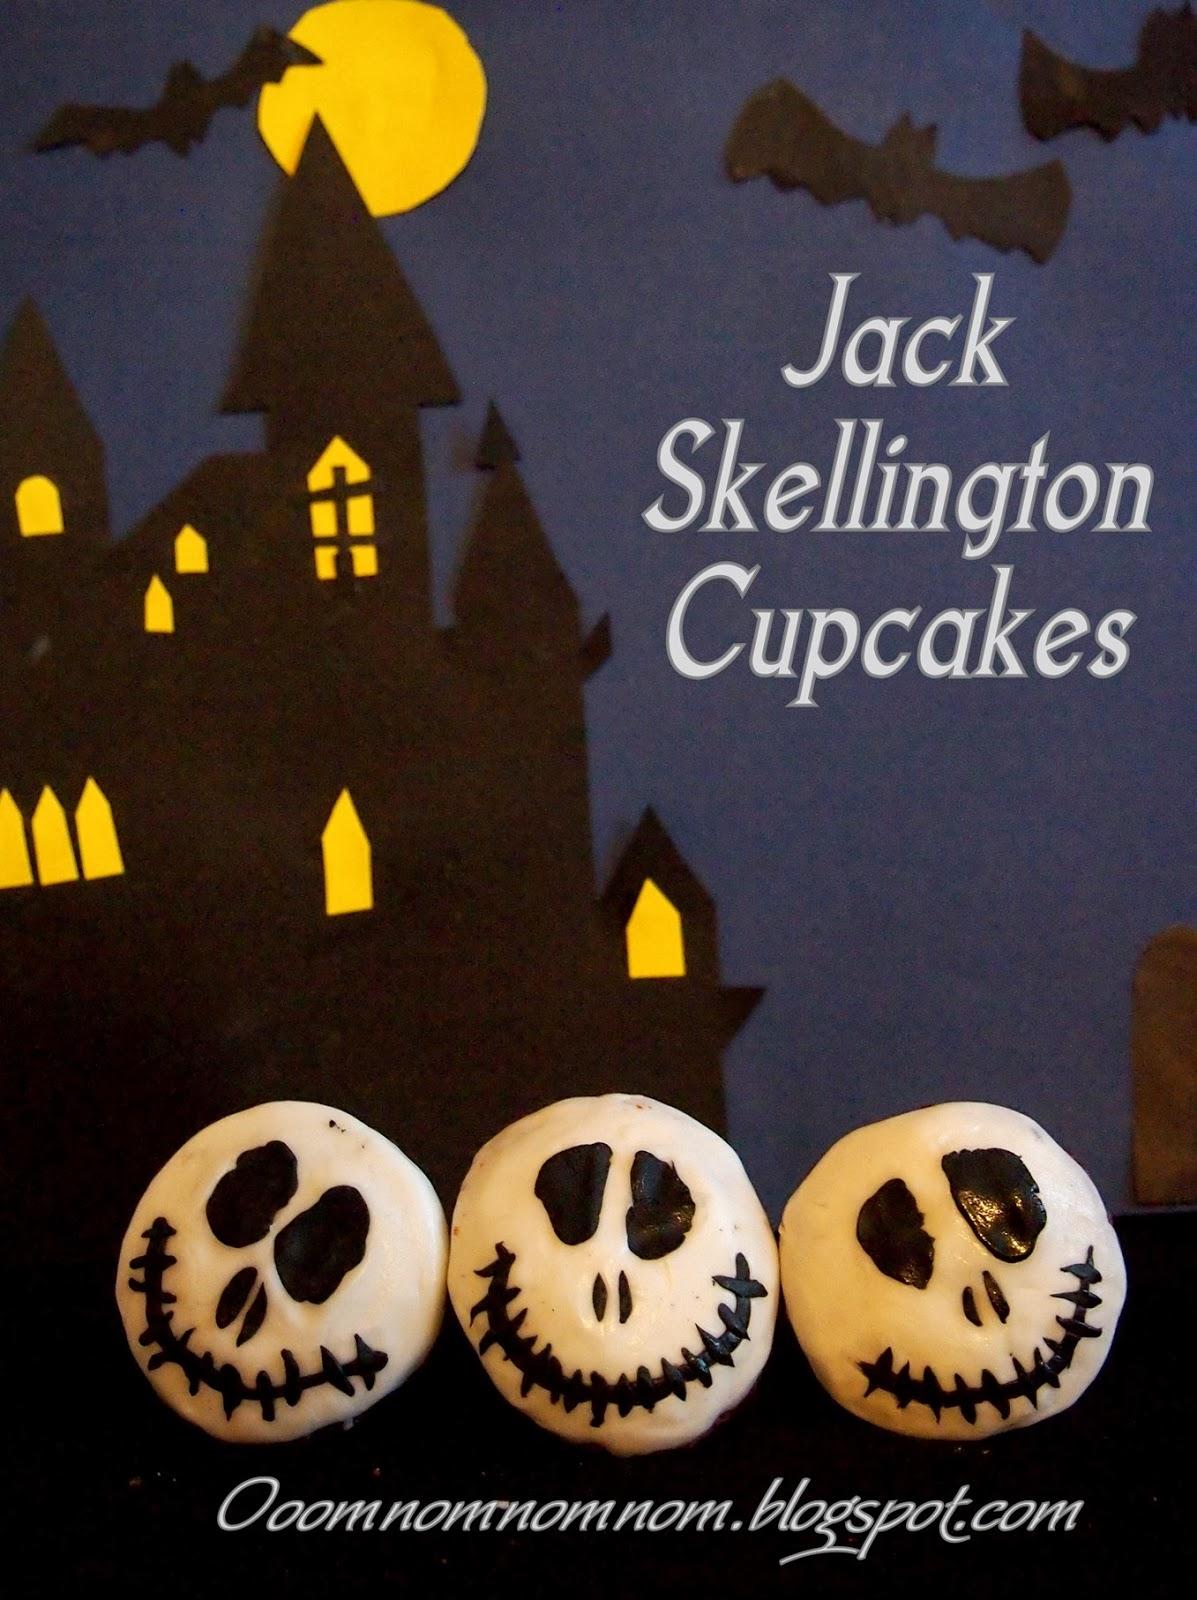 Jack Skellington Cupcakes